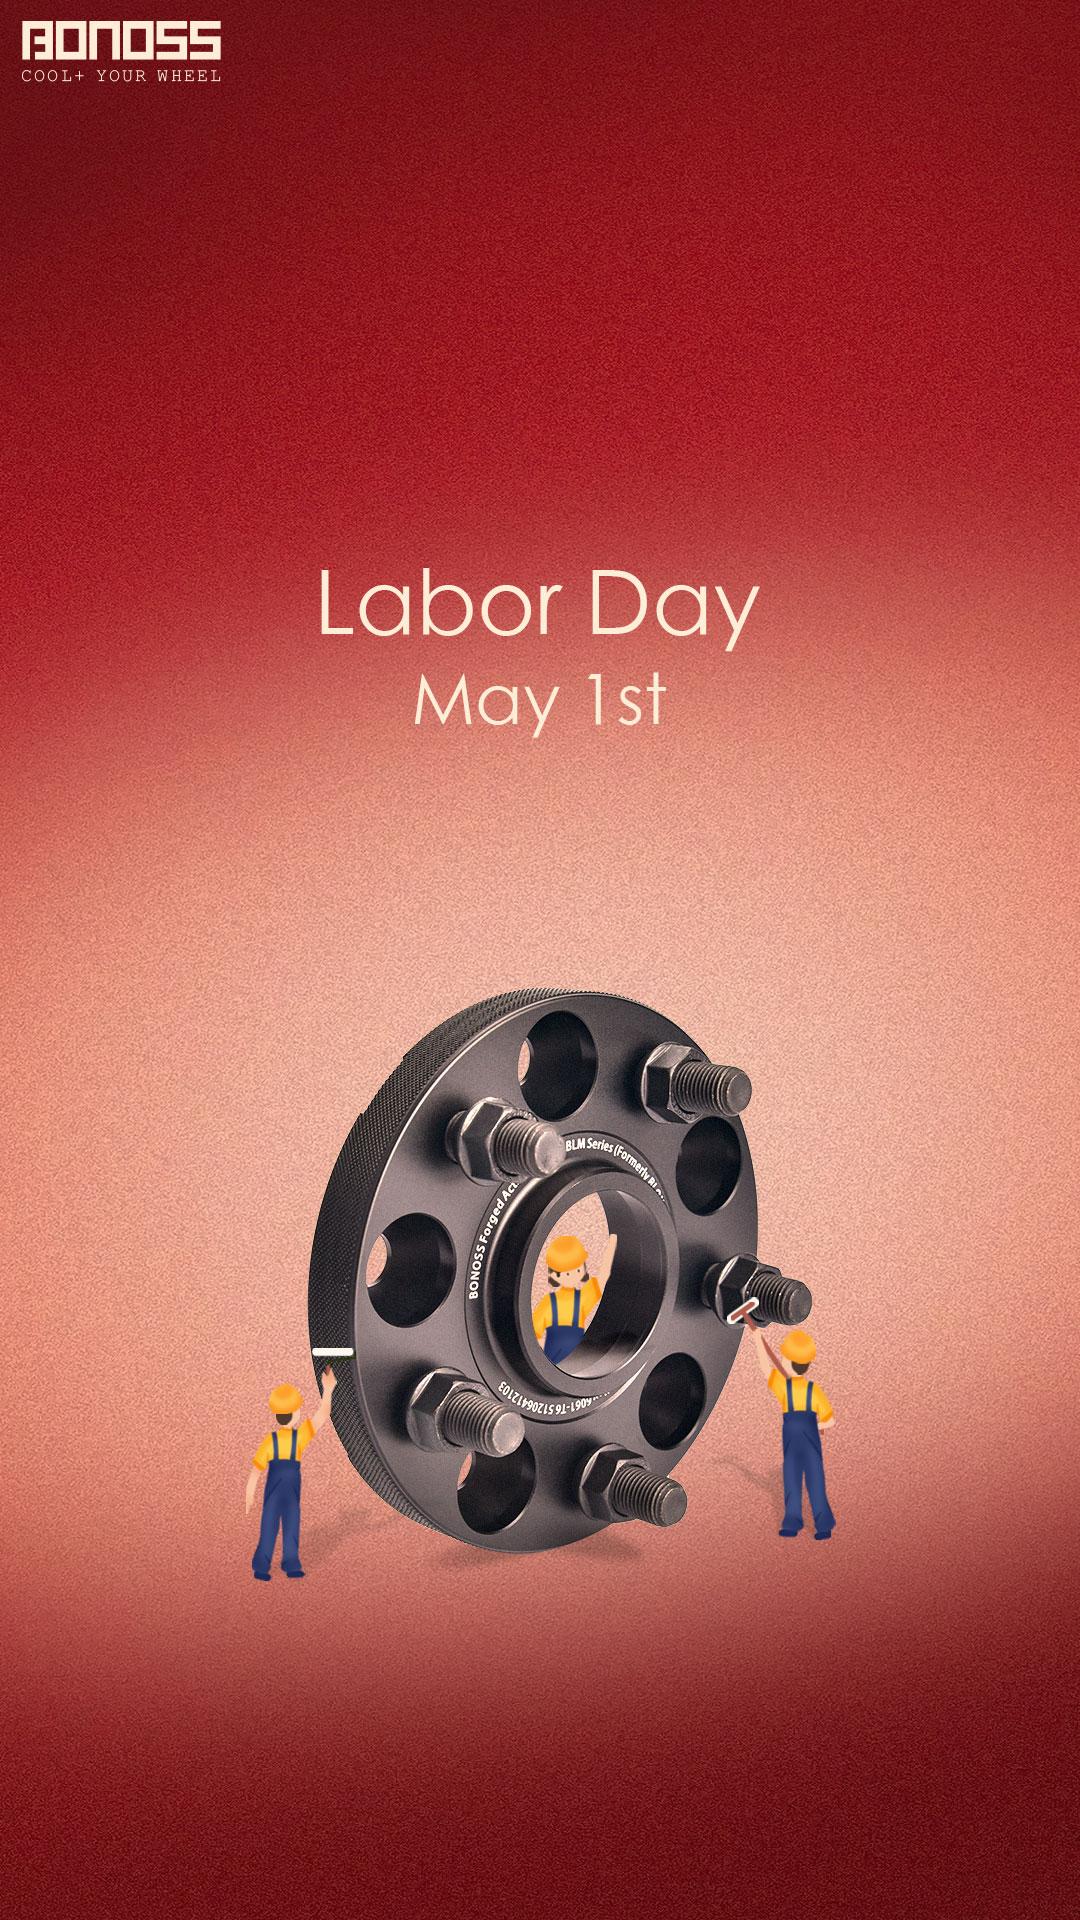 Happy Labor Day! Celebrate with BONOSS